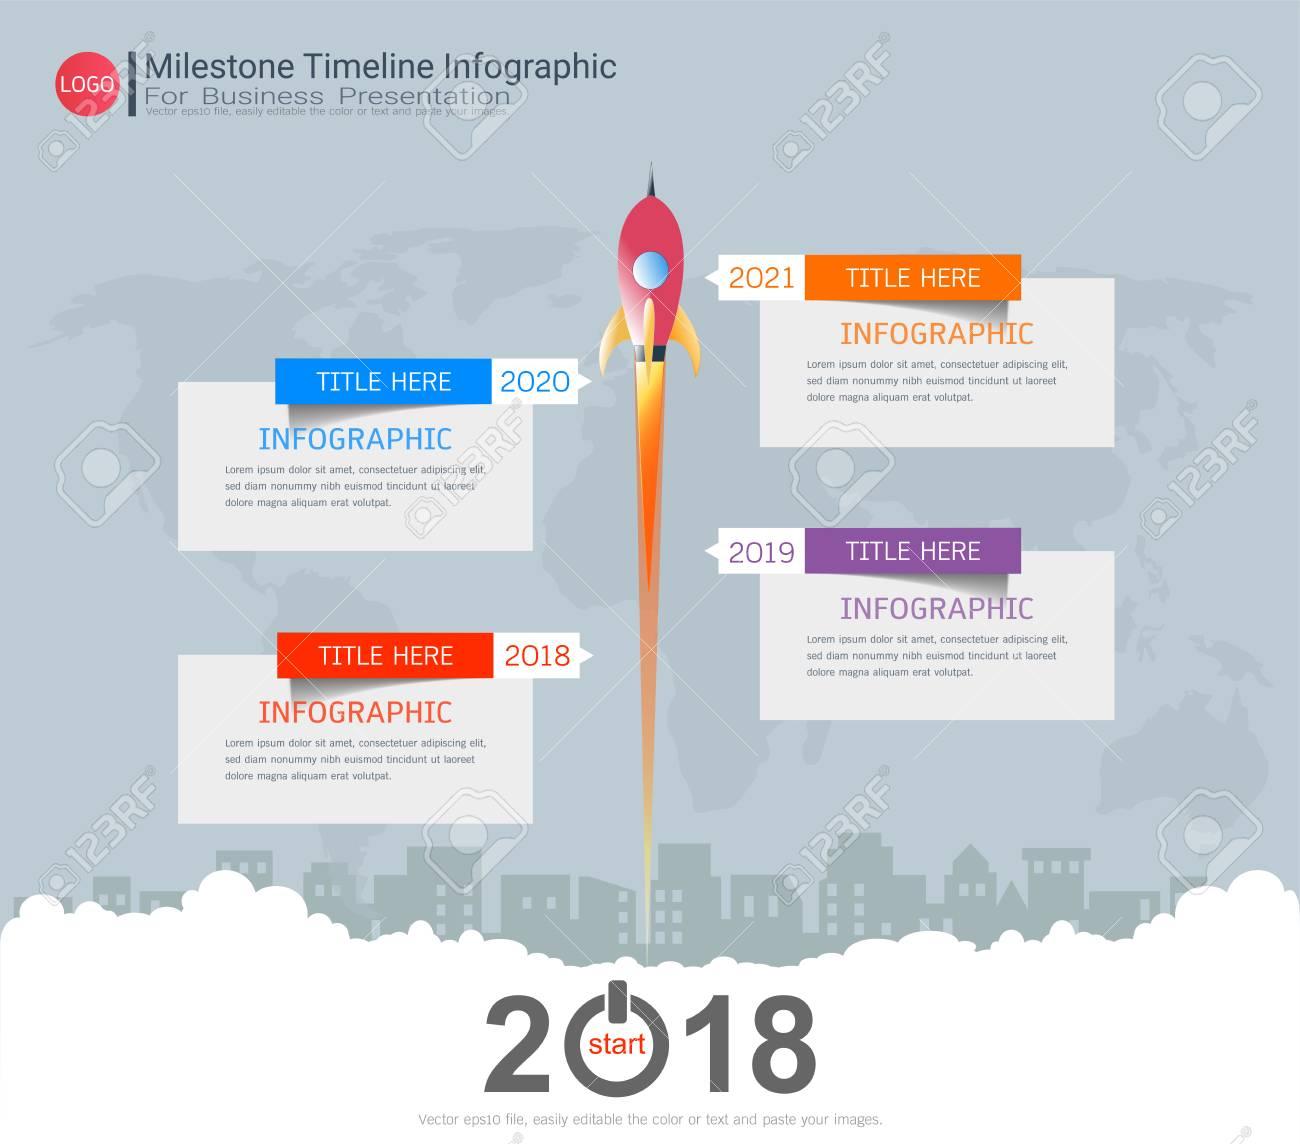 Milestone Timeline Infographic Design, Roadmap Or Strategic Plan ...